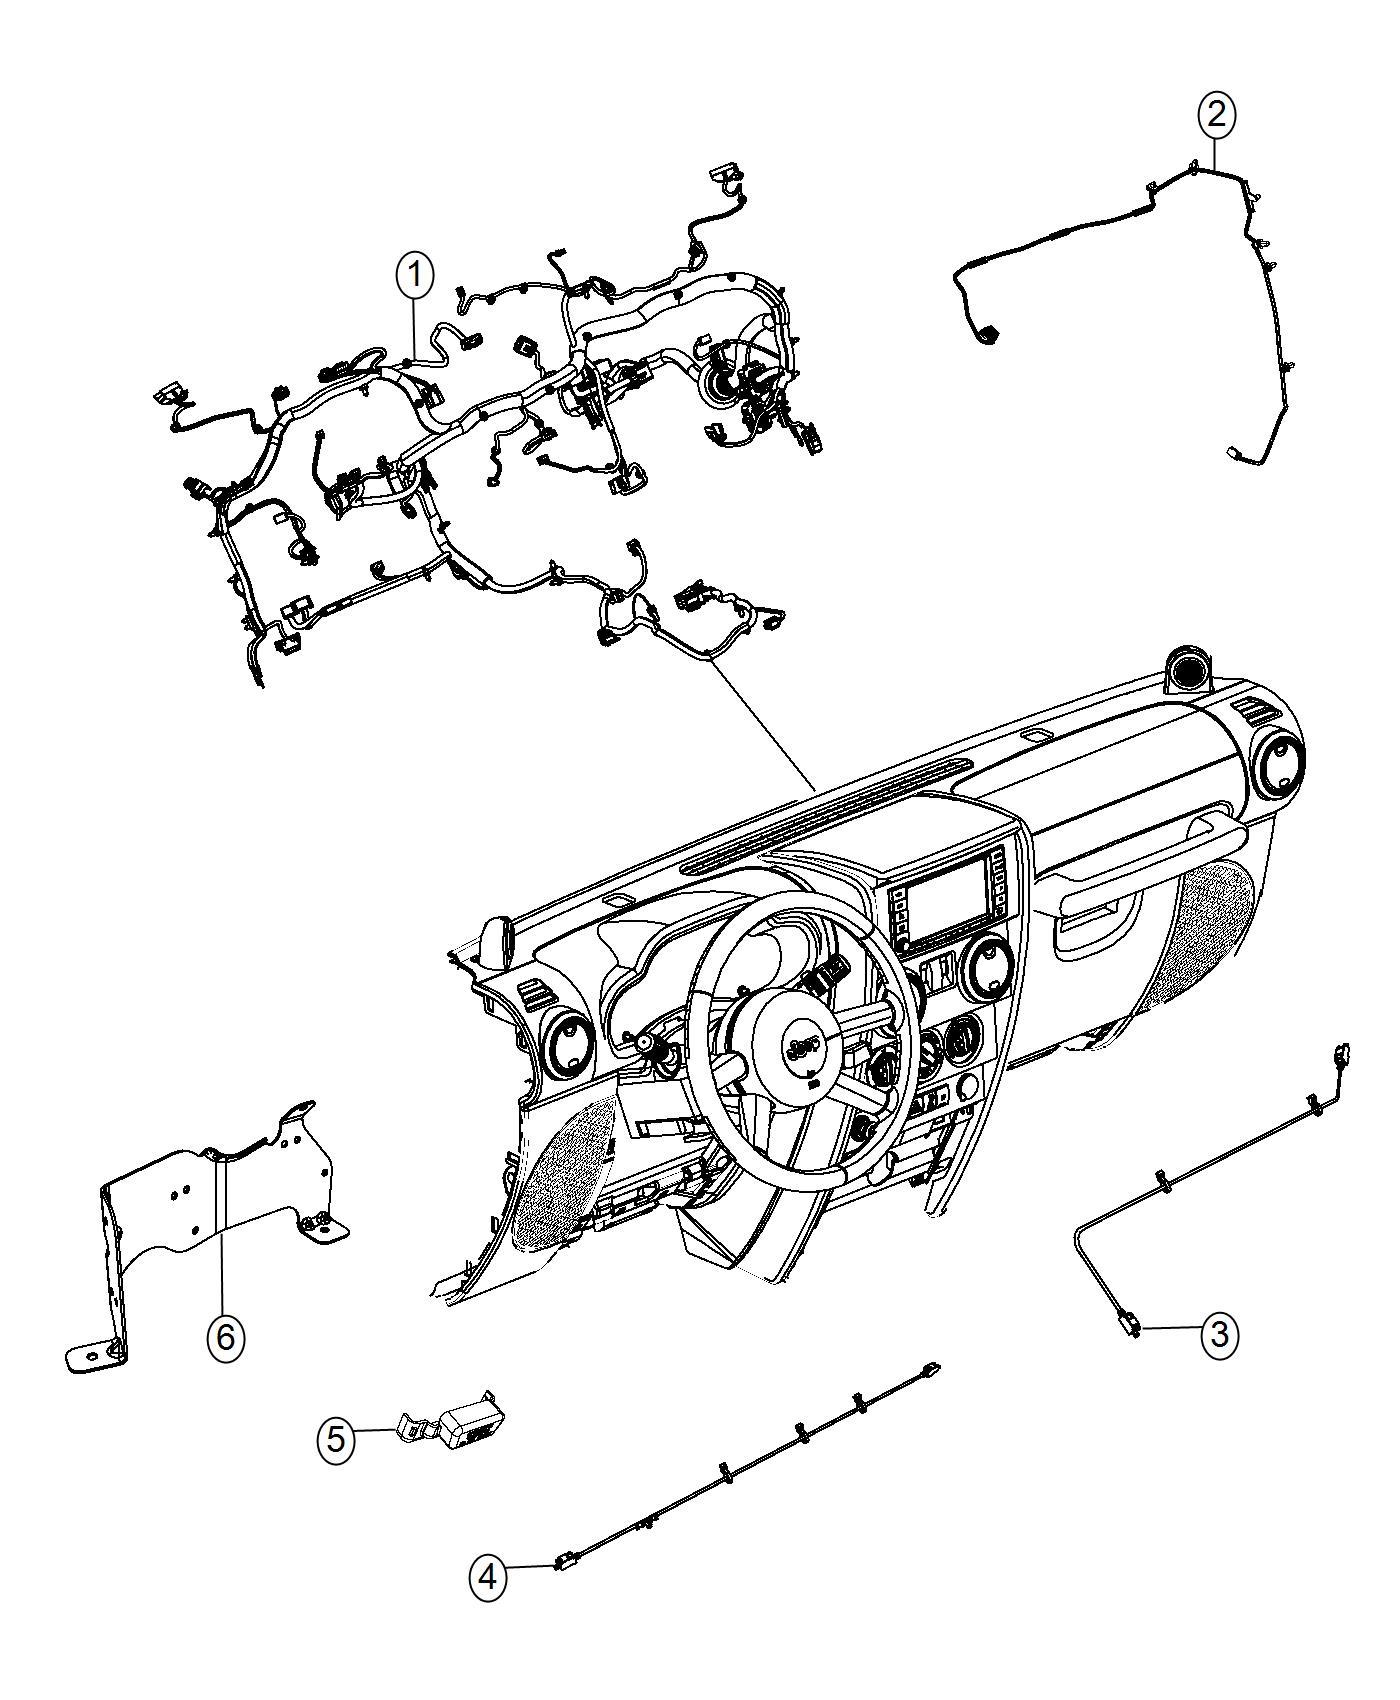 Wiring Diagram For Jeep Wrangler Radio